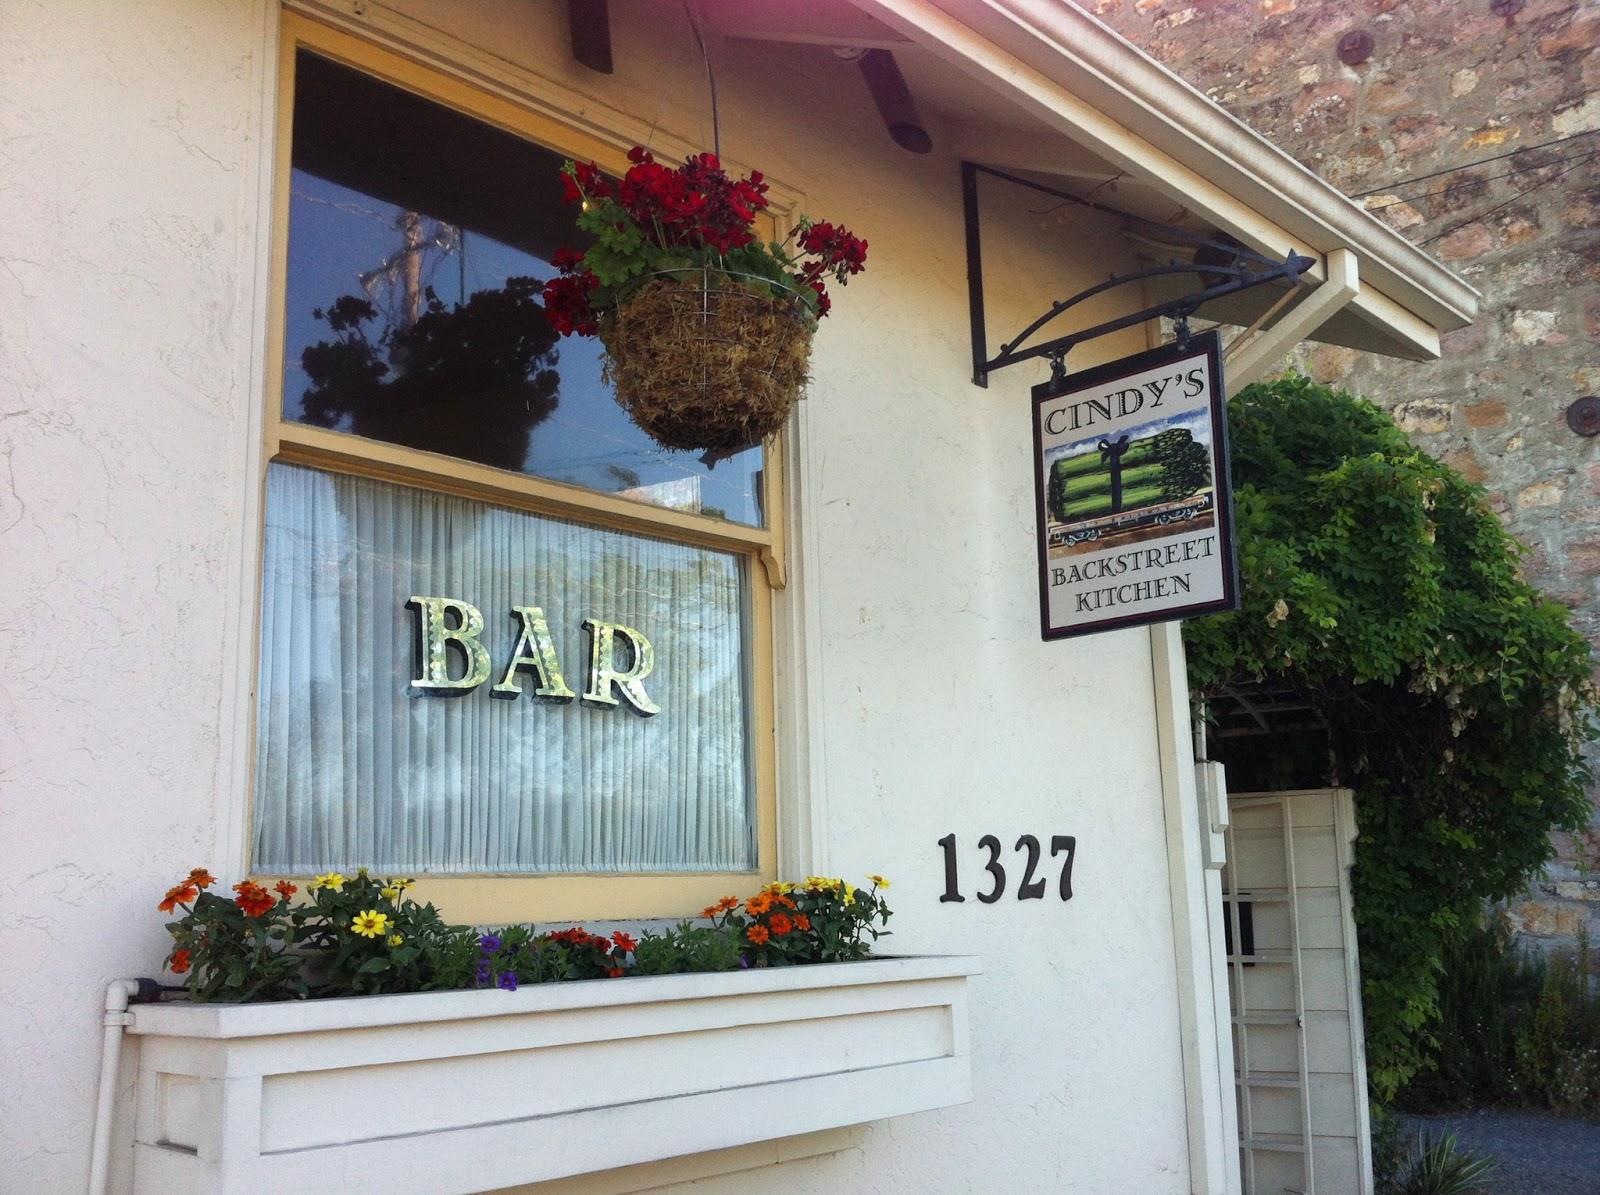 cindys backstreet kitchen st helena napa bistro bbq barbecue barbeque bar b q bar - Cindys Backstreet Kitchen